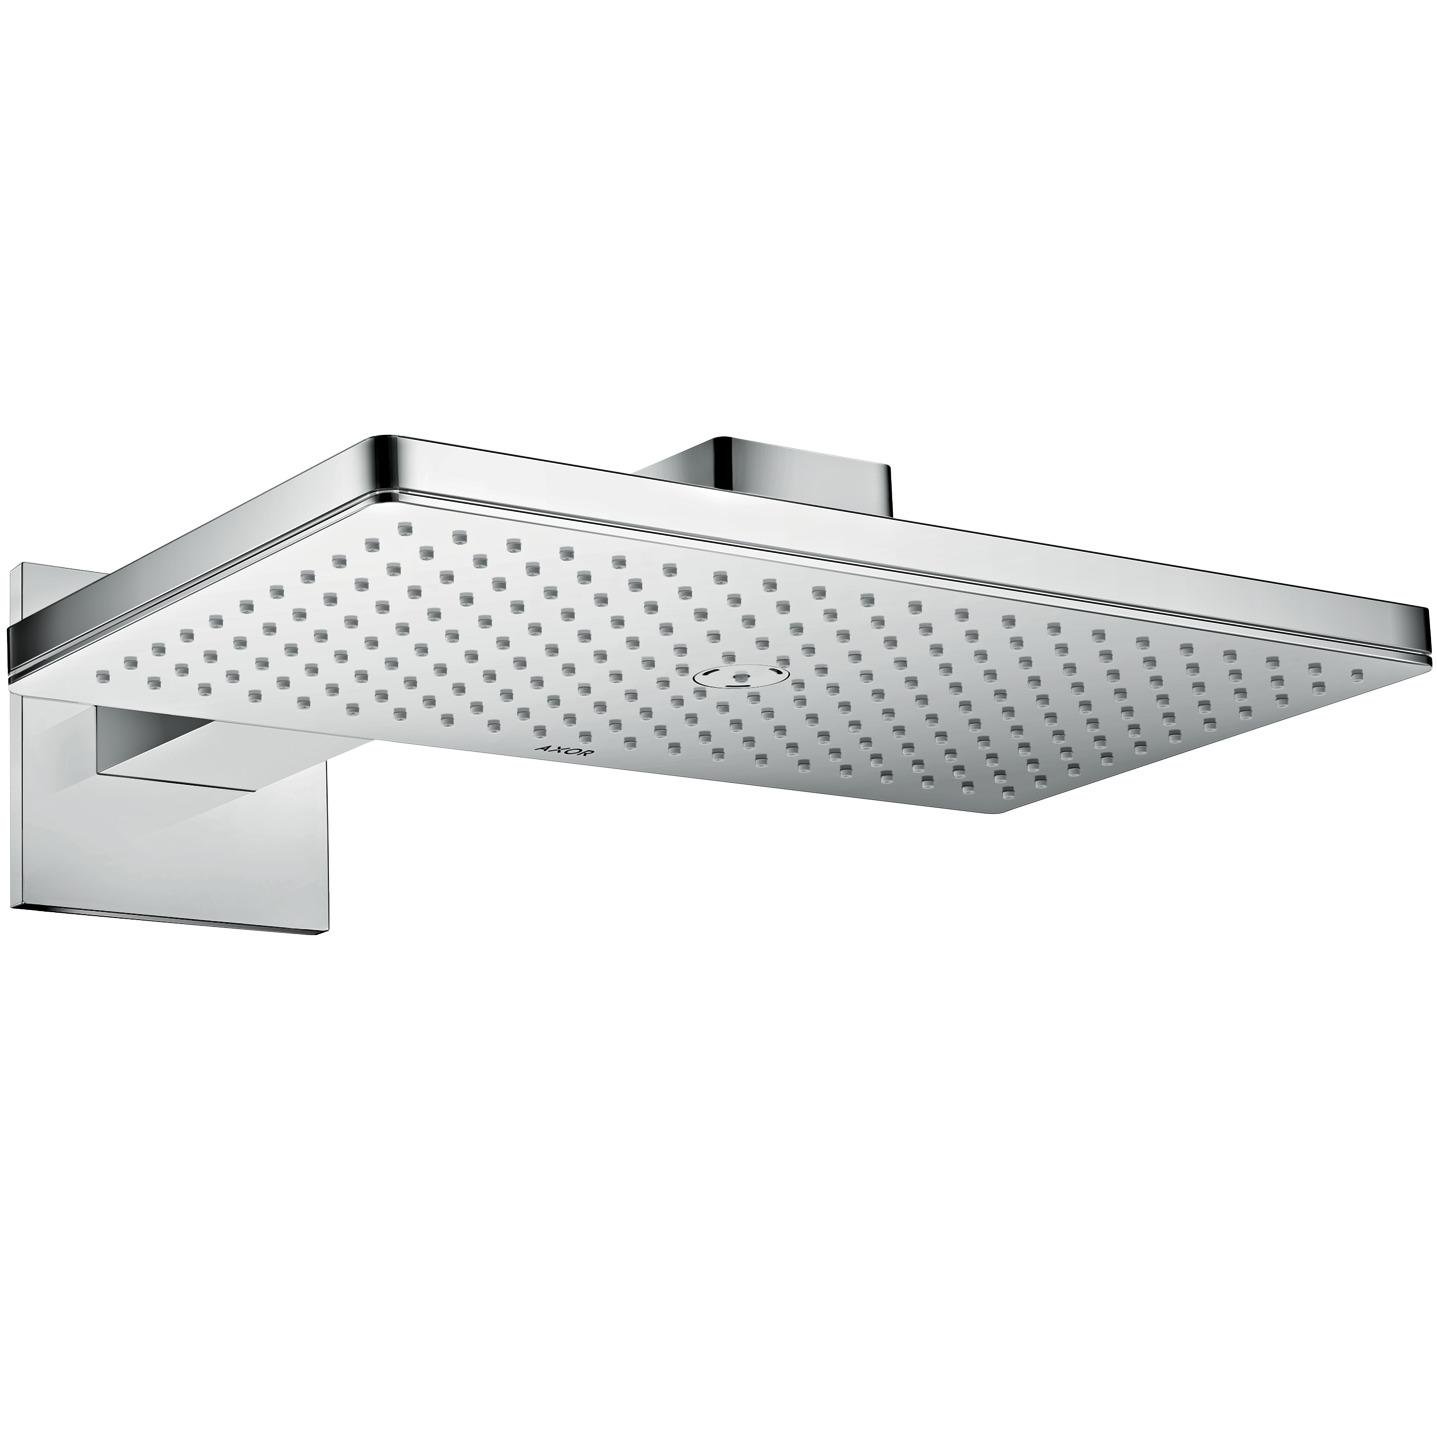 Axor Int Axor Showersolutions 1 Spray Mode 35278000